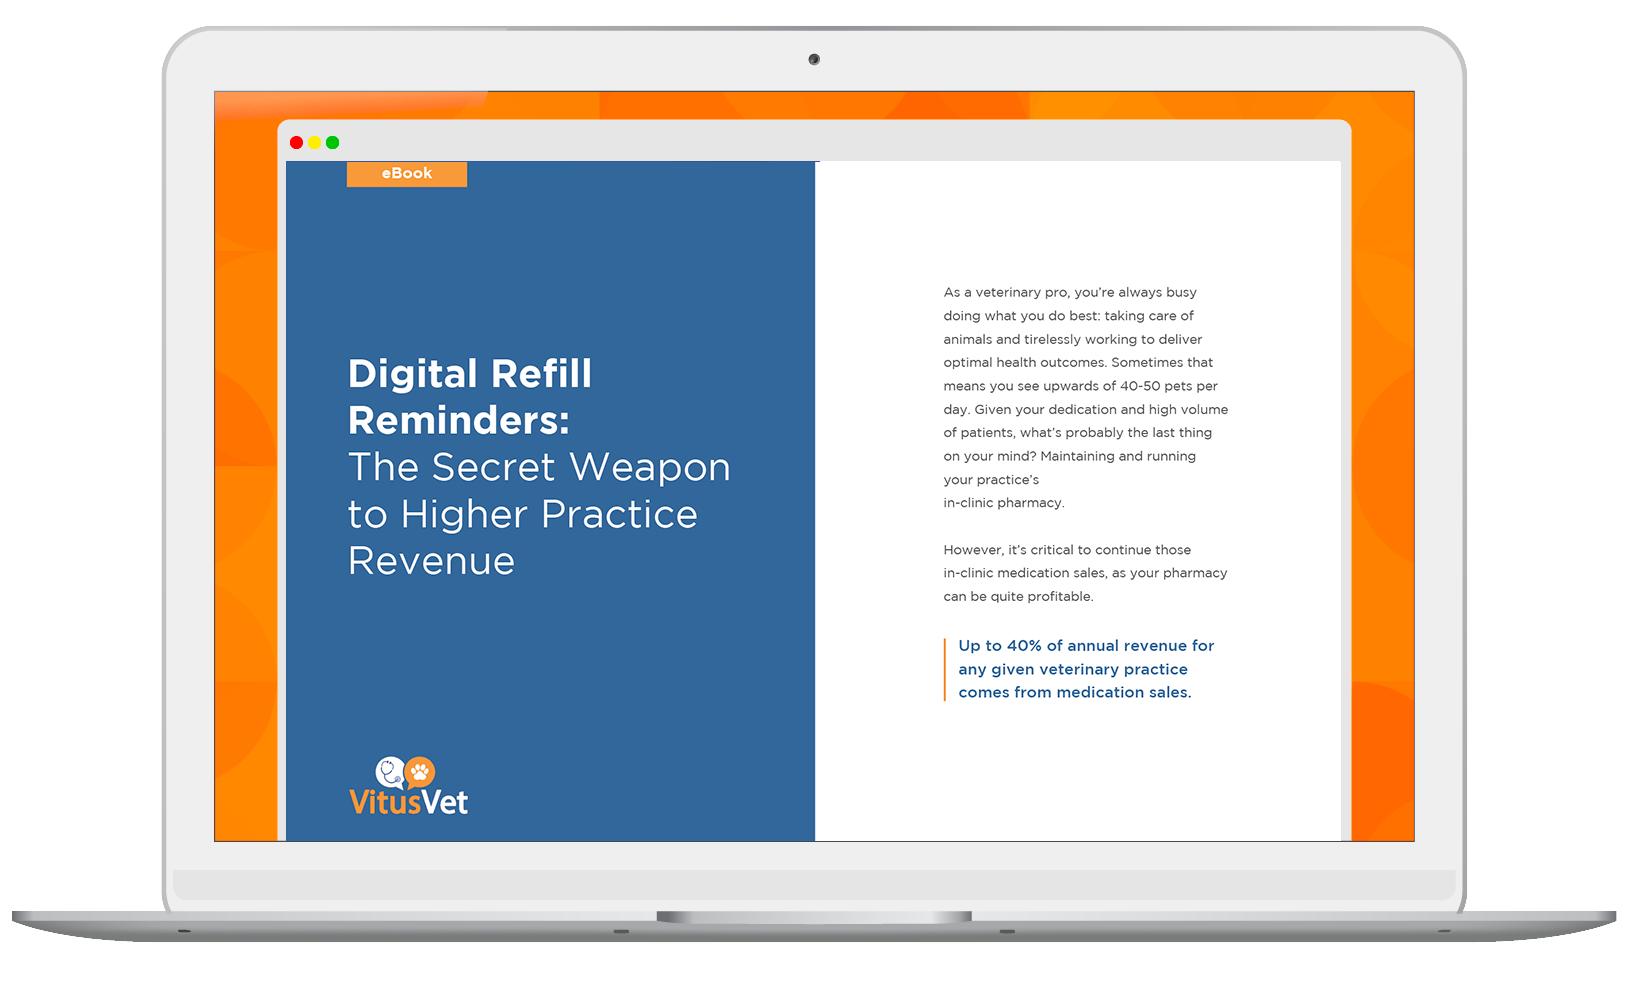 Digital-refill-reminder-eBook-landingpage-image